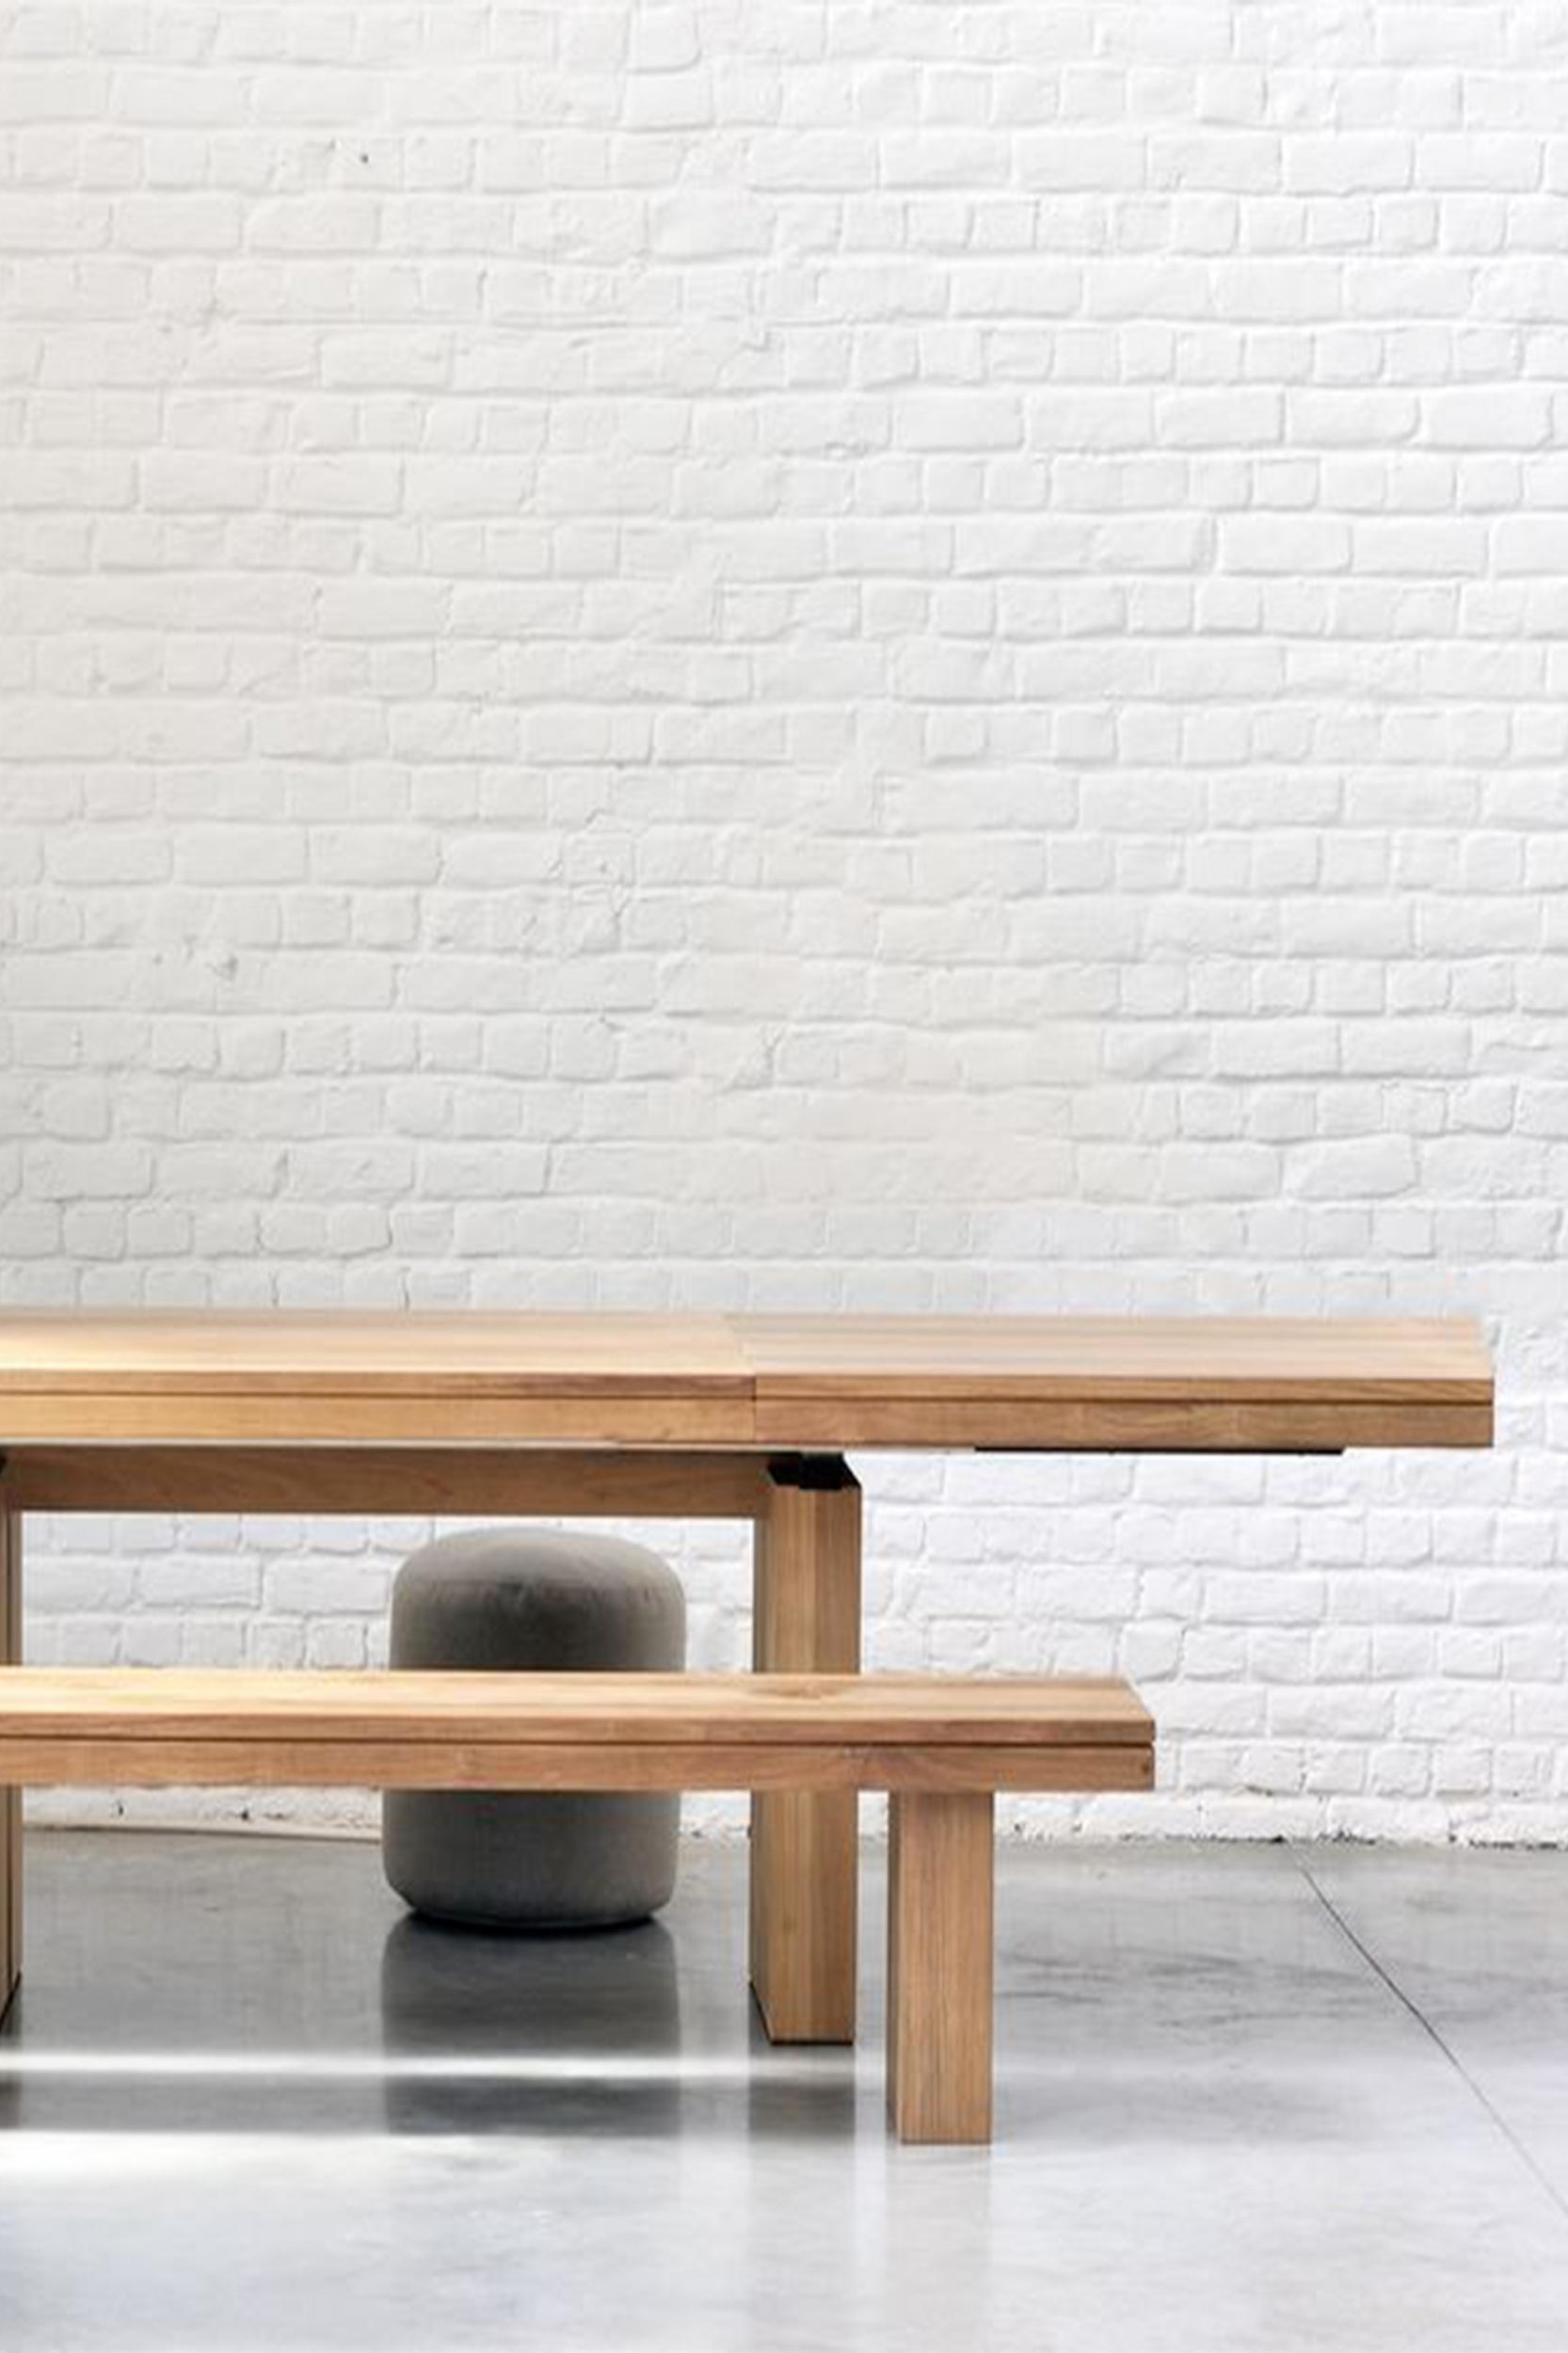 12066-Teak-Double-extendable-dining-table-12085-Teak-Double-bench.jpg.jpg